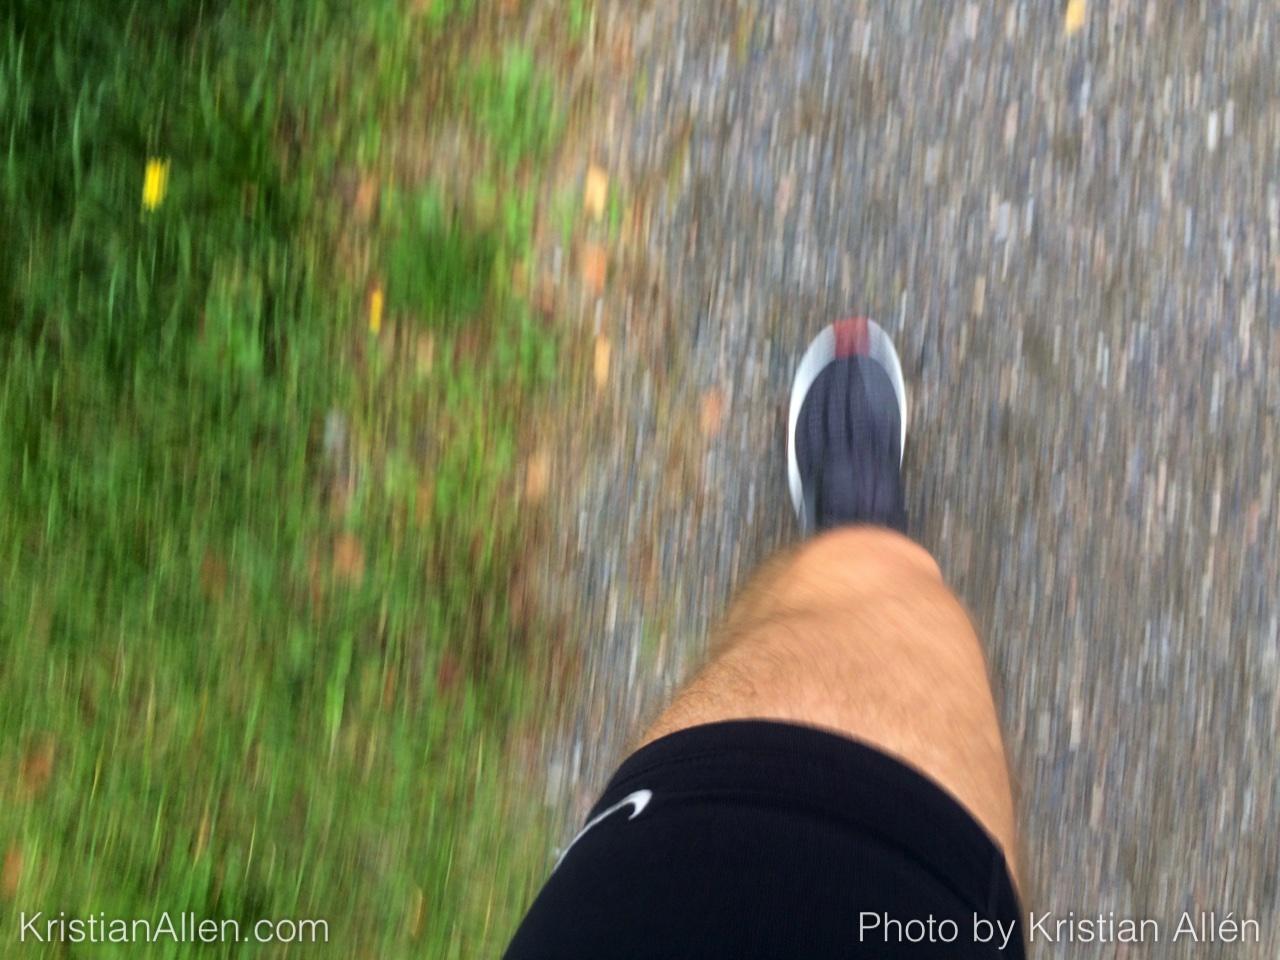 22.8.2016 8.16 km Run